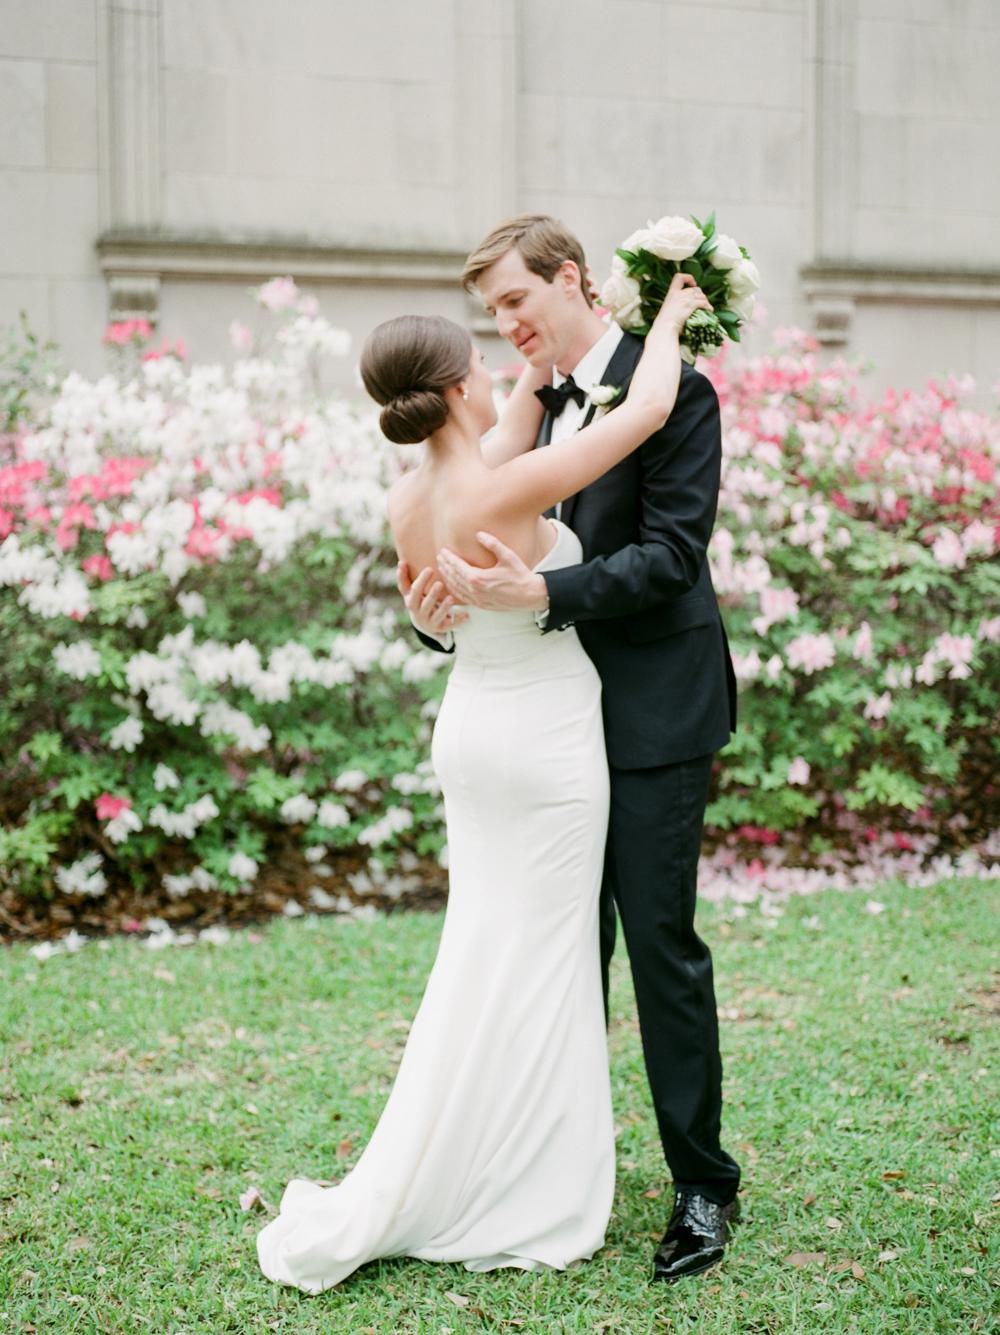 Christine Gosch - destination film photographer - houston wedding photographer - fine art film photographer - elopement photographer - destination wedding - understated wedding - simple beautiful wedding photography-68.jpg